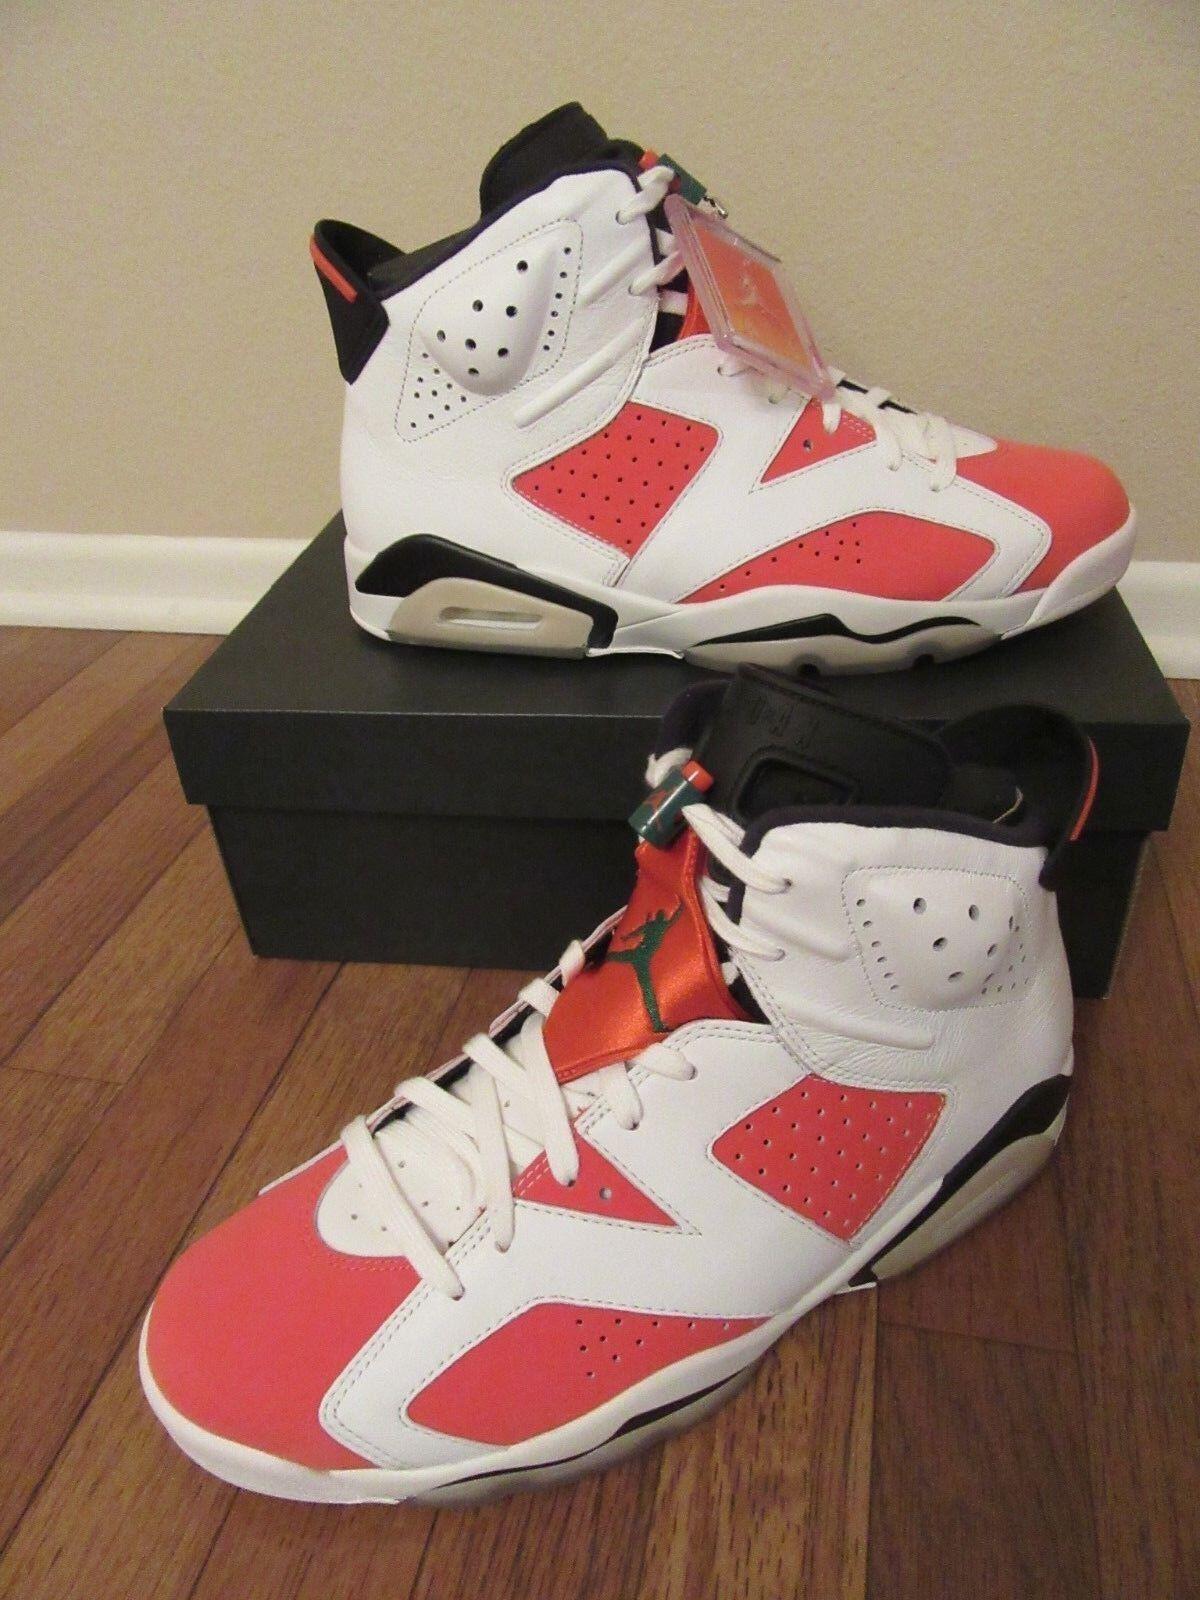 Nike Air Jordan 6 Retro VI Size 11.5 Summit White Team orange Black 384664 145